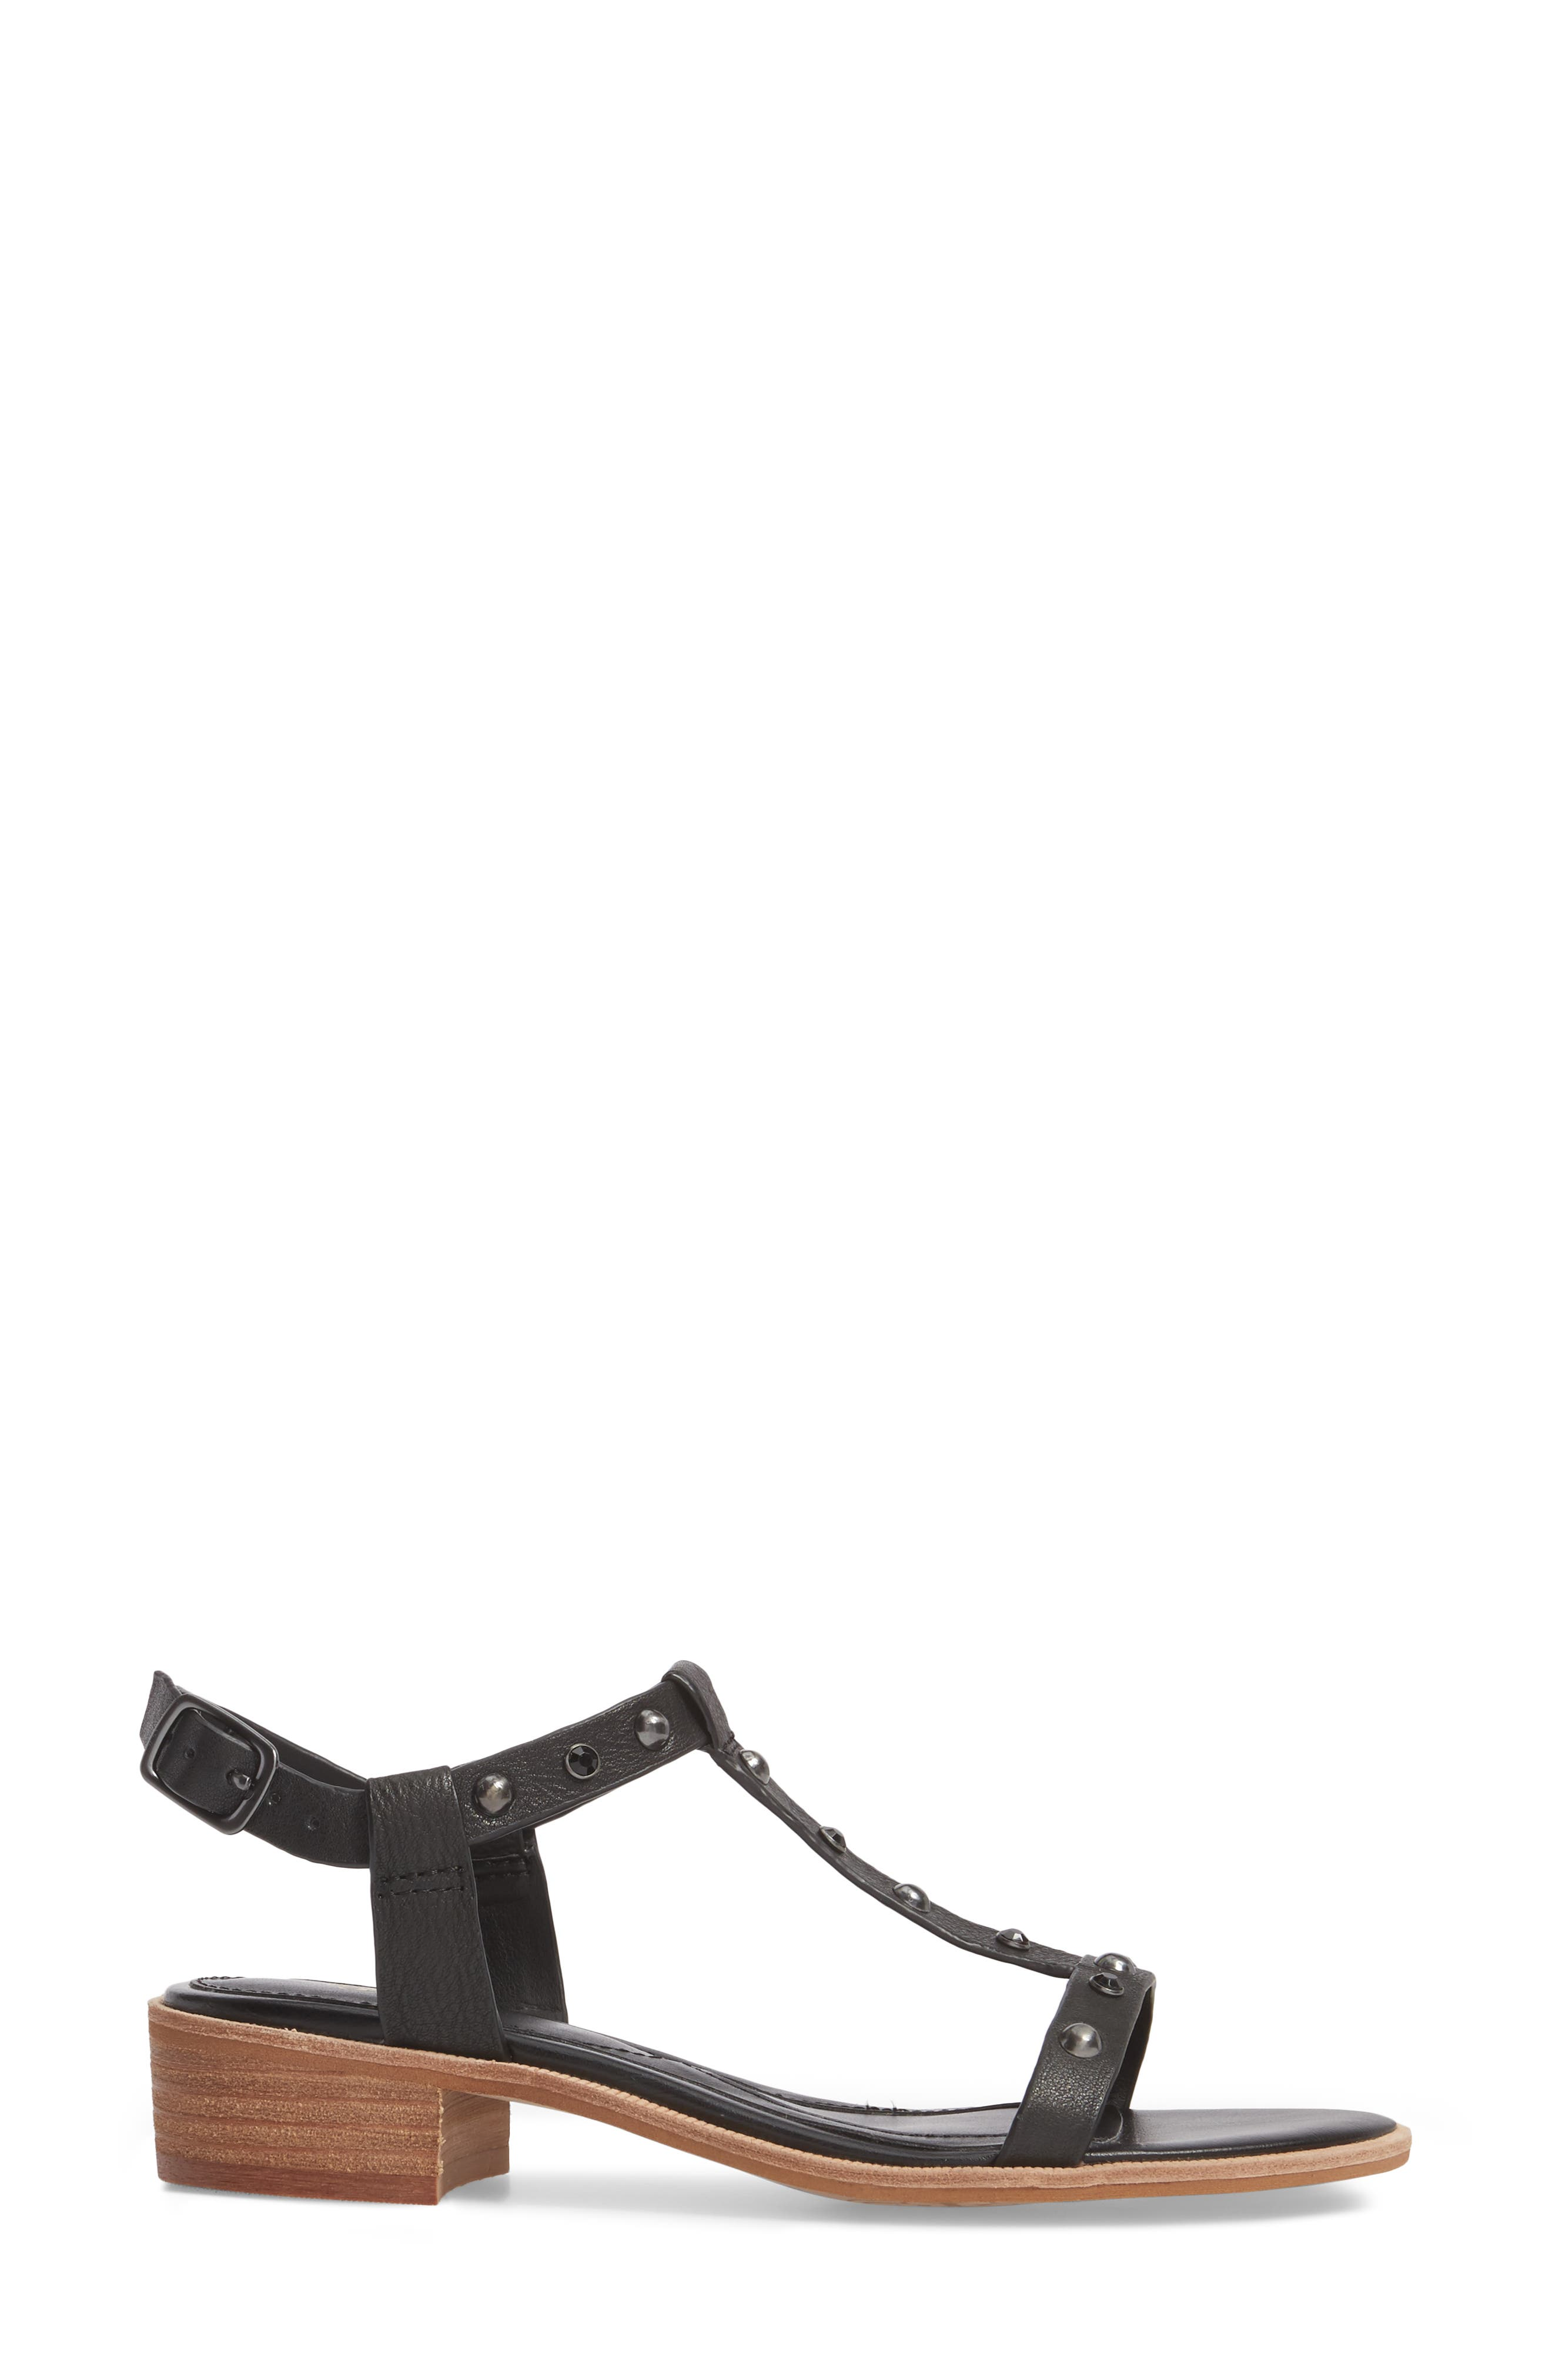 Giana Studded Sandal,                             Alternate thumbnail 3, color,                             BLACK LEATHER